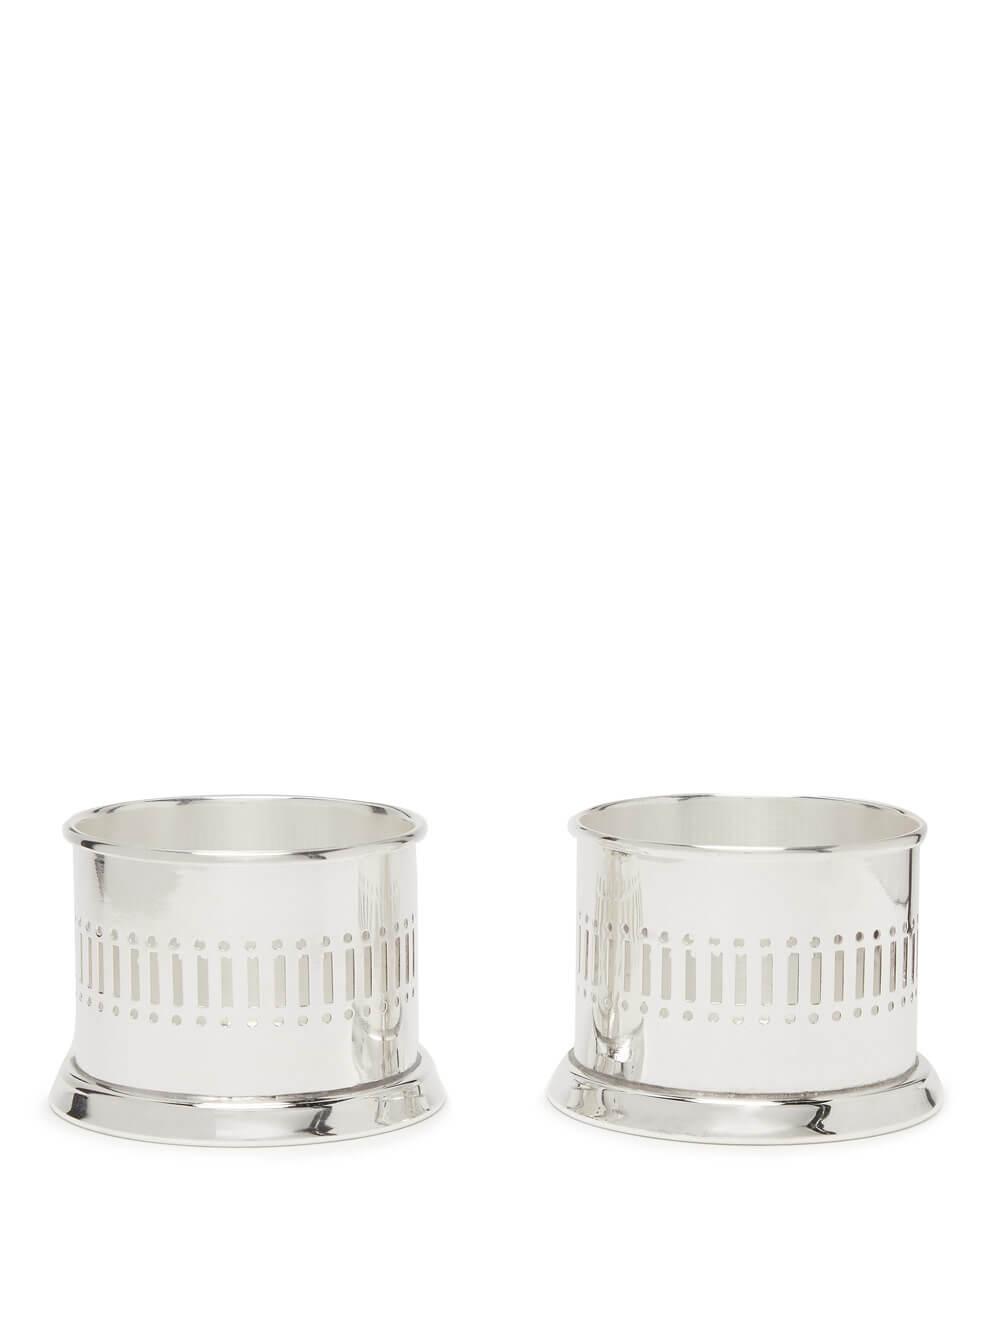 Silver-plated Tea Lights Set - Silverware - The Wolseley Shop